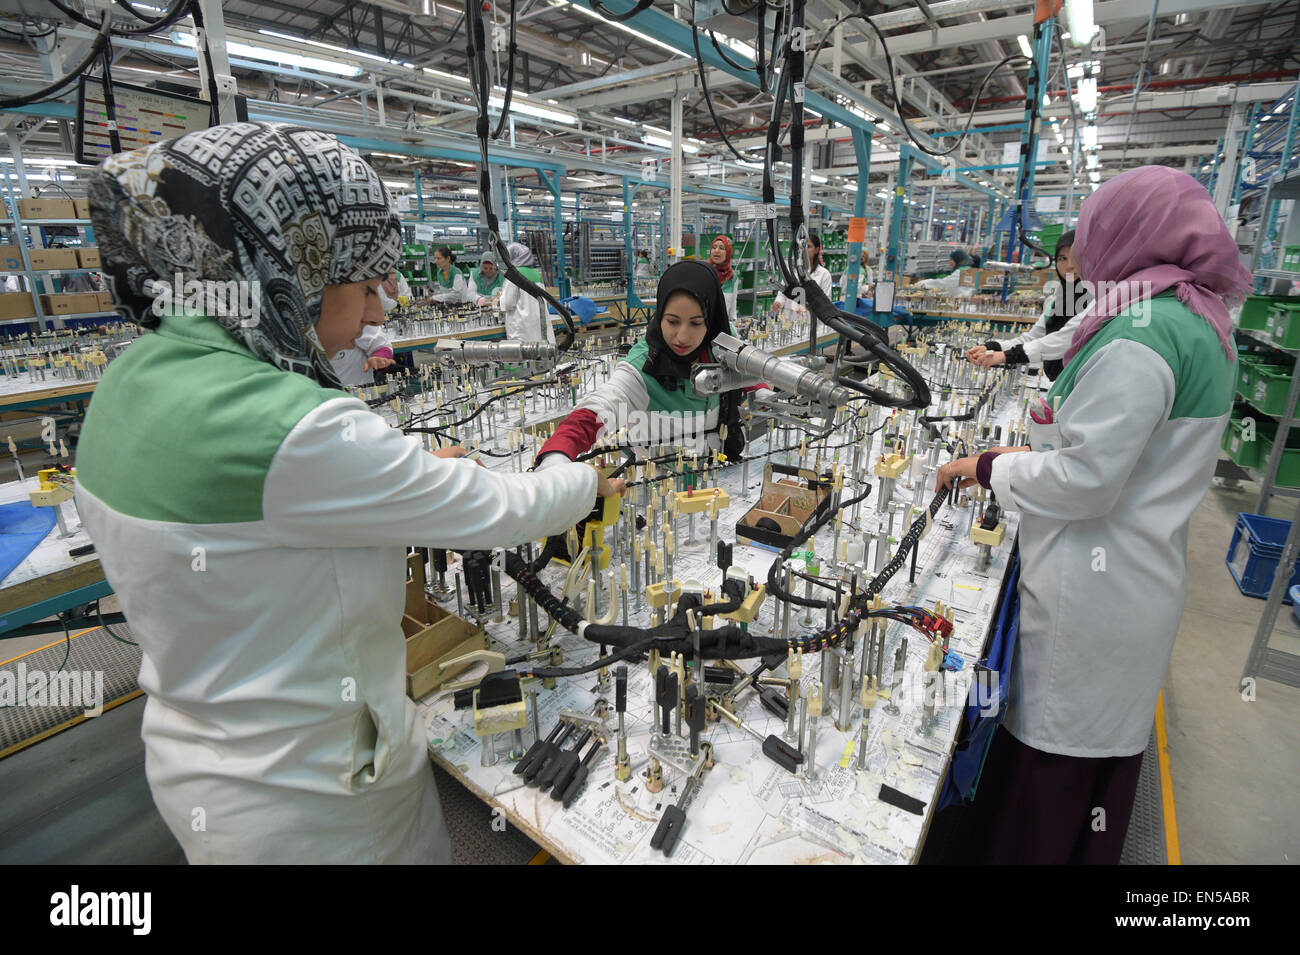 Wiring Harness Manufacturer Tunisia Diagrams Automotive Suppliers Stock Photos Images Alamy Rh Com Car Custom